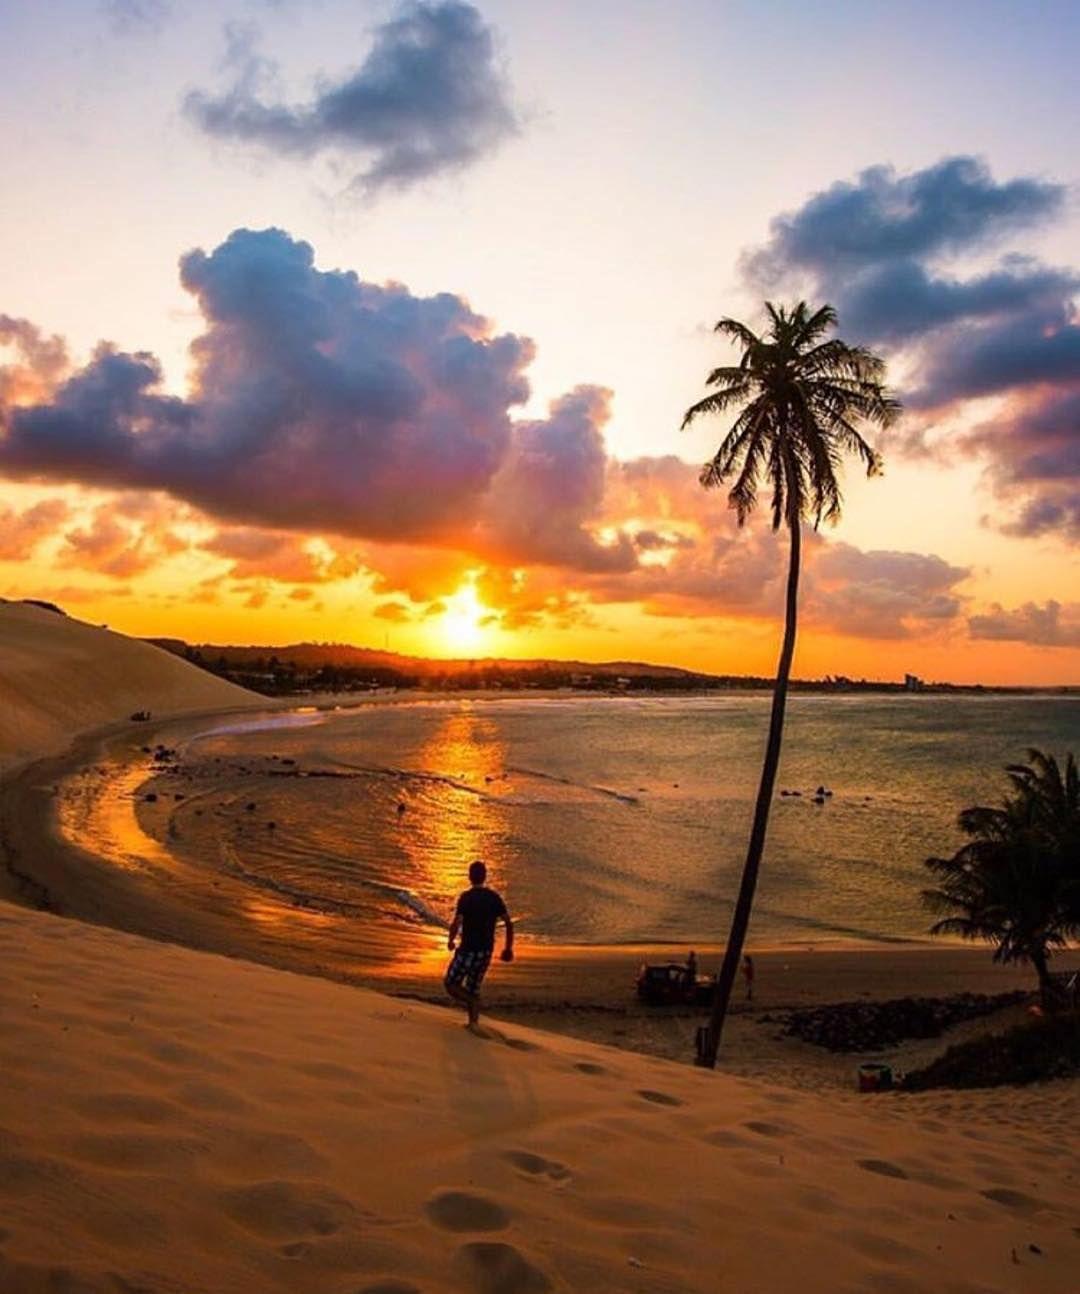 "238.5 mil curtidas, 909 comentários - BEAUTIFUL DESTINATIONS (@beautifuldestinations) no Instagram: ""Golden hour at the beach 🙌🏻 (📷: @cbezerraphotos)"""